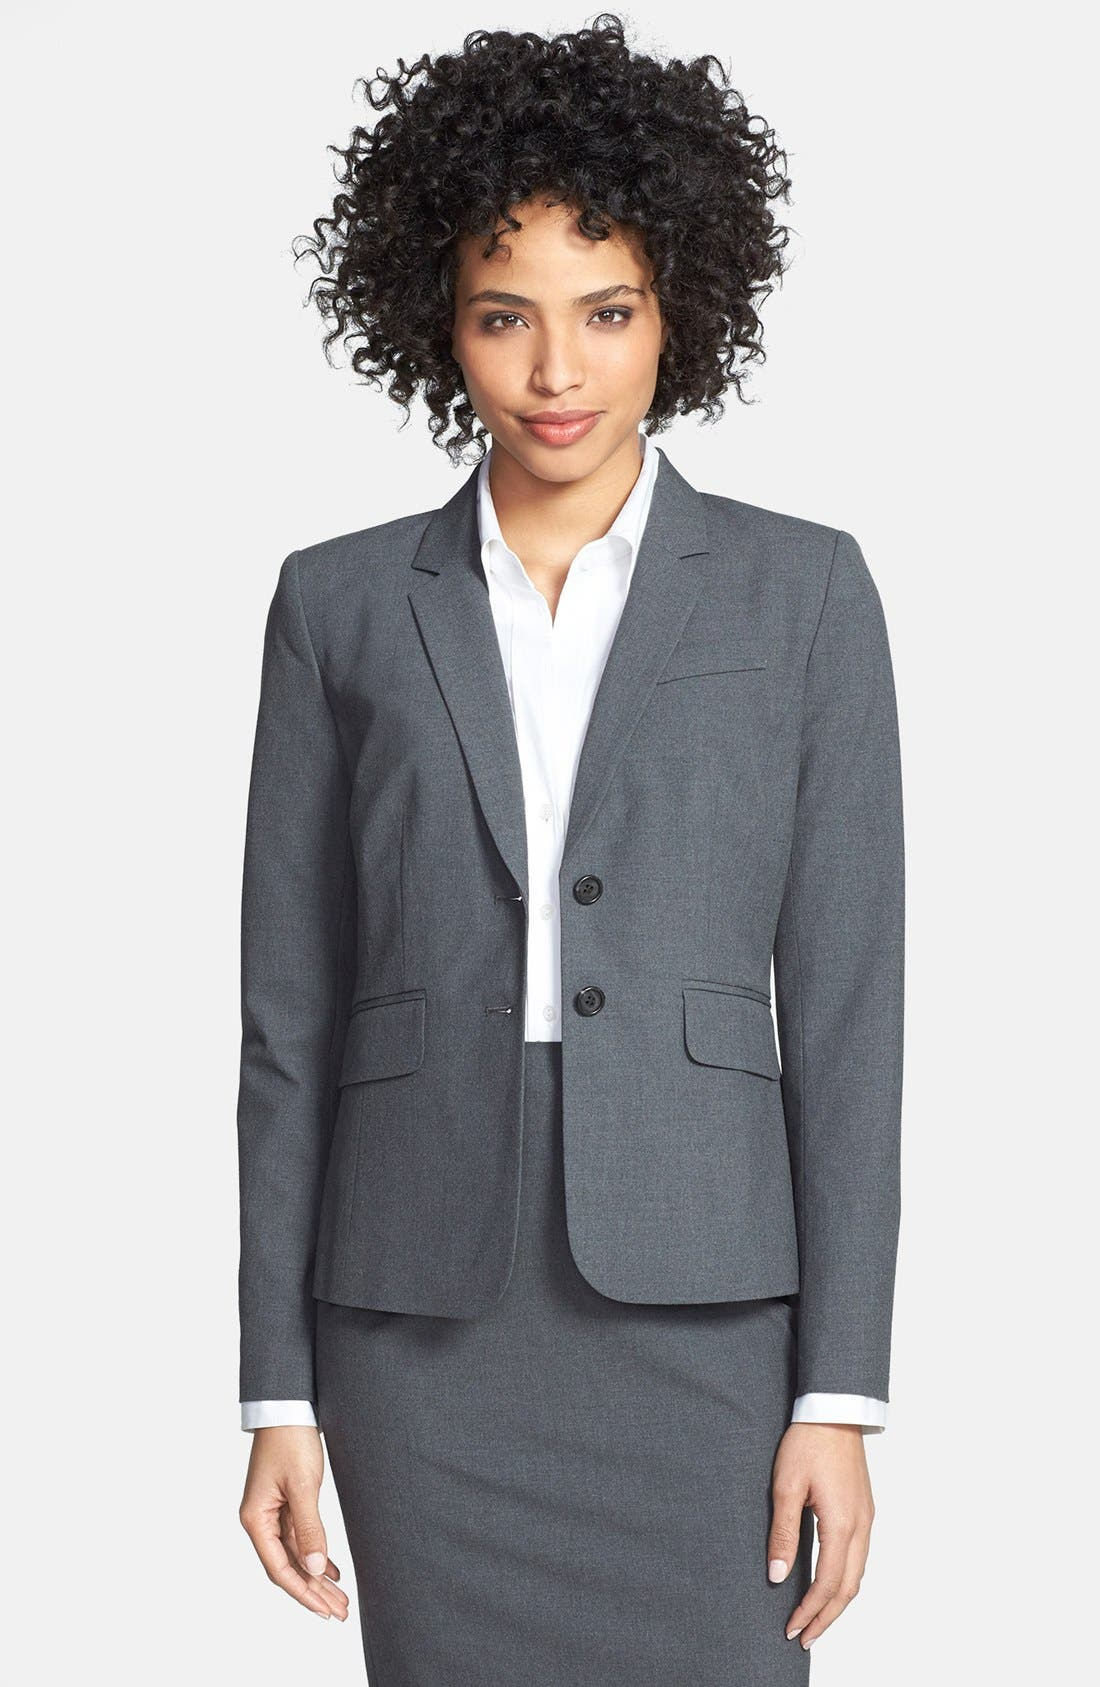 Alternate Image 1 Selected - Halogen® 'Ela' Suit Jacket (Regular & Petite)